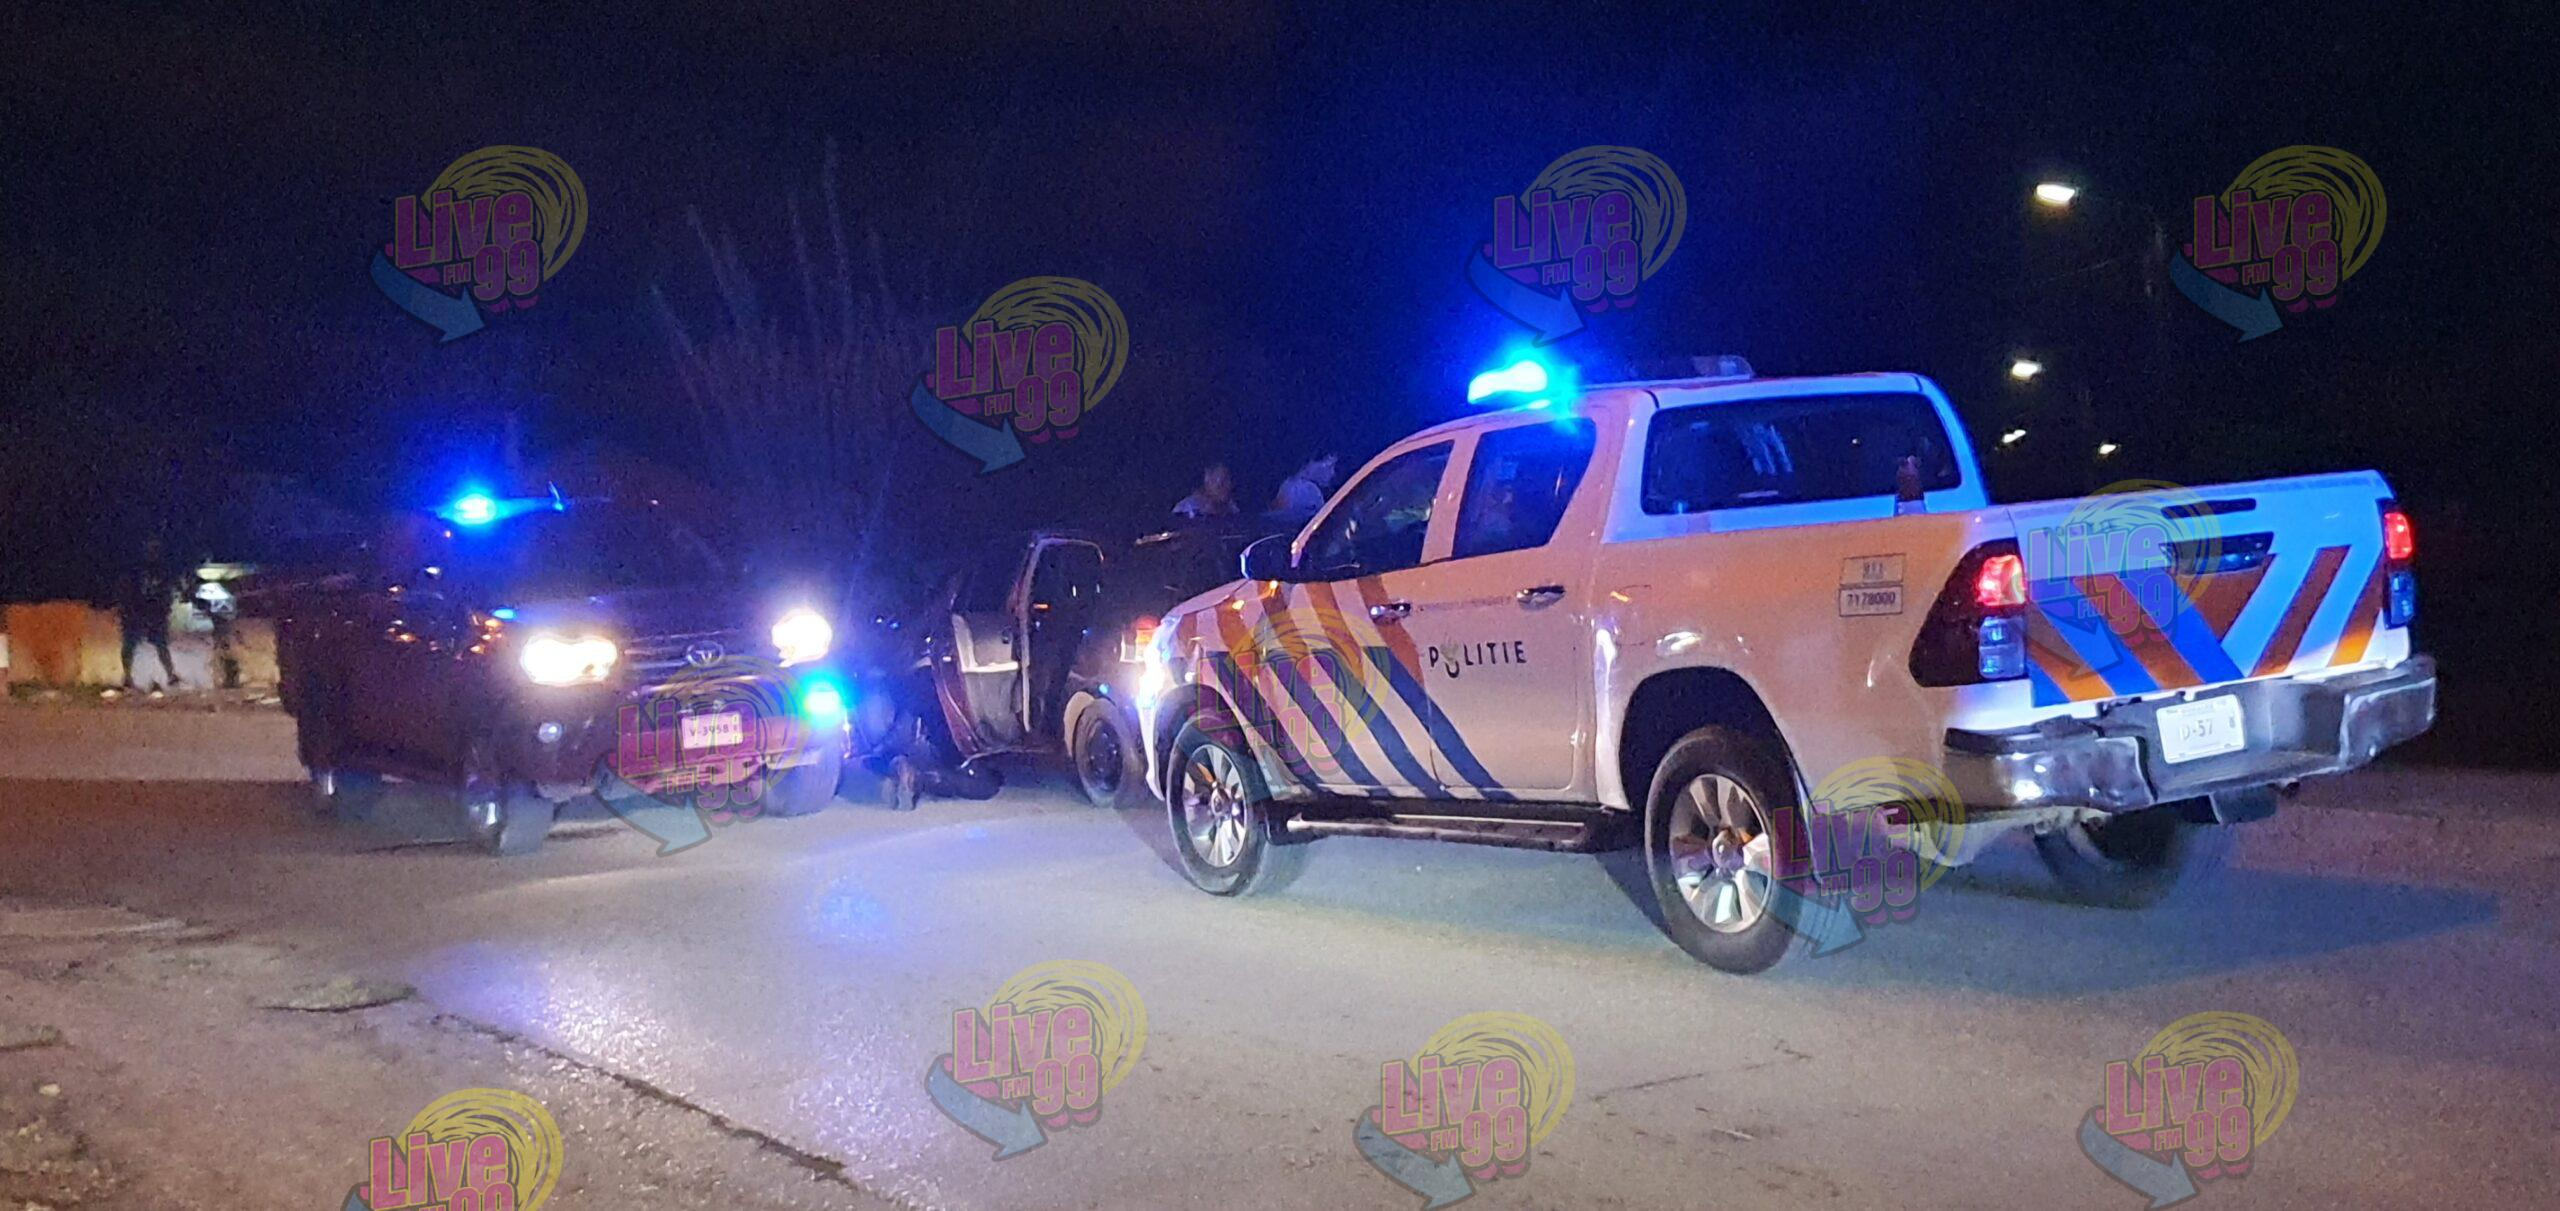 NOTISIA NAN POLISIAL DI DJABIÈRNÈ 16 DI APREL TE KU DJALUNA 19 DI APREL 2021